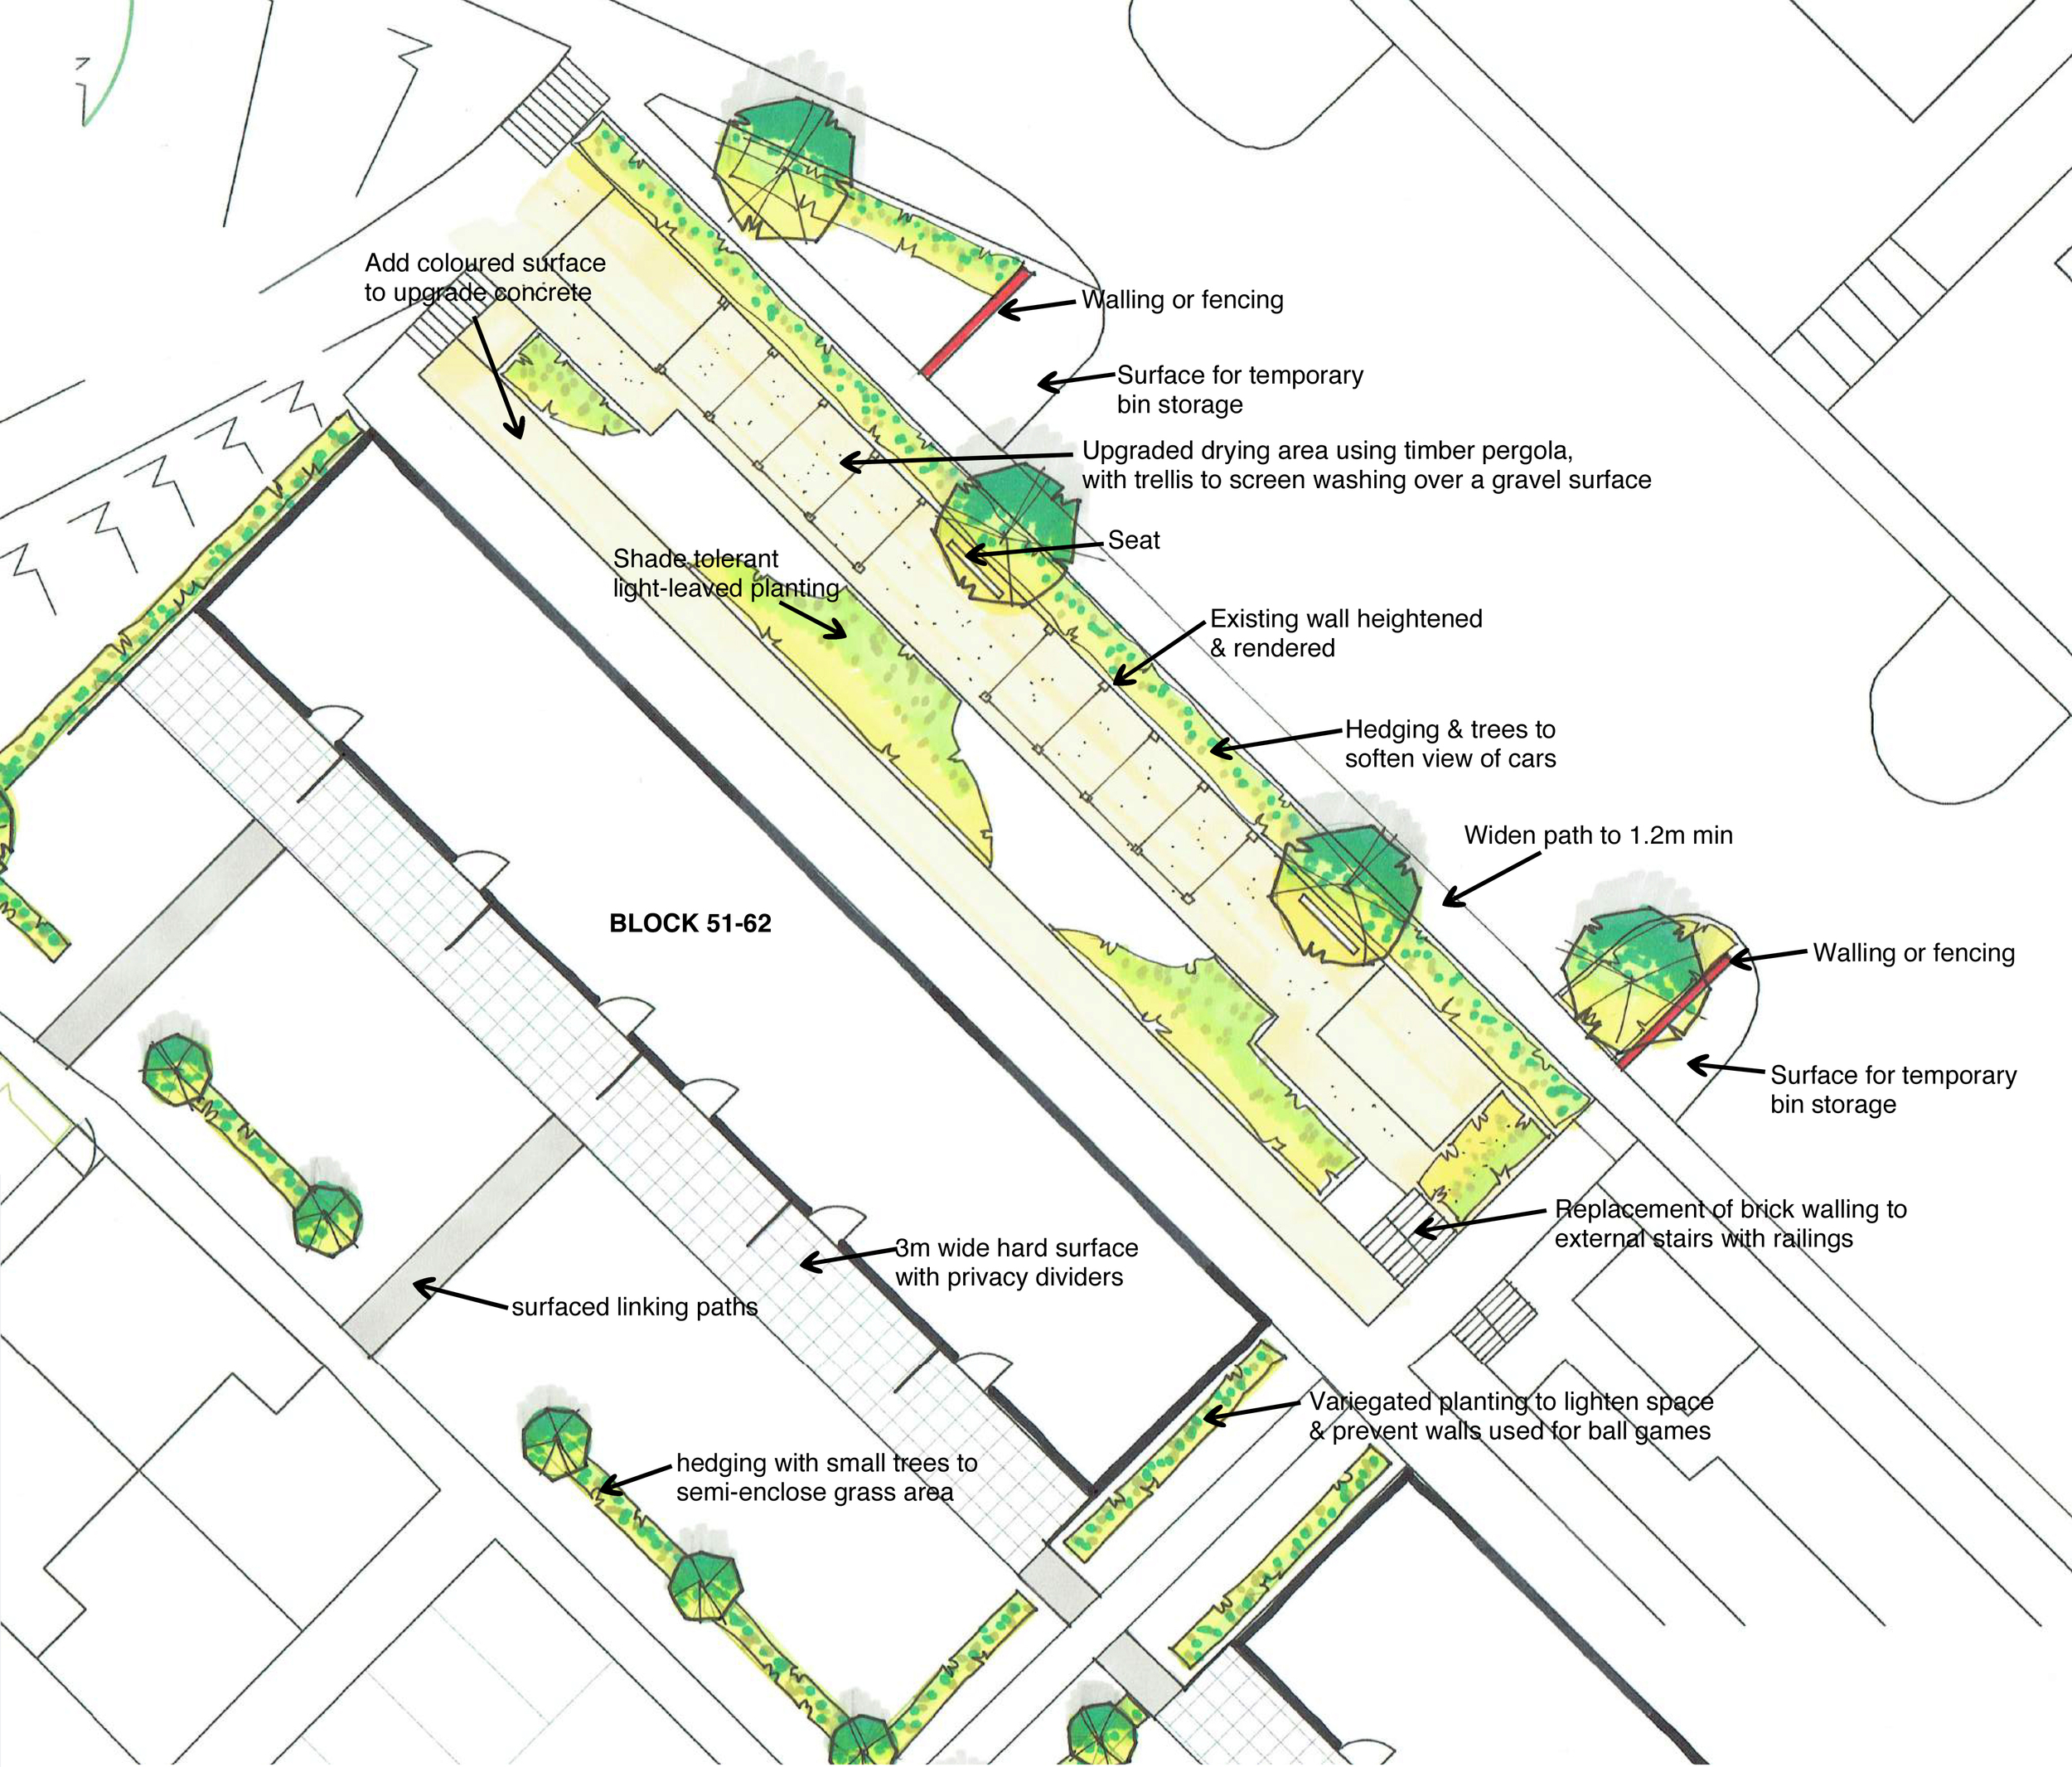 Landscape proposals plan by Mackley Davies Associates